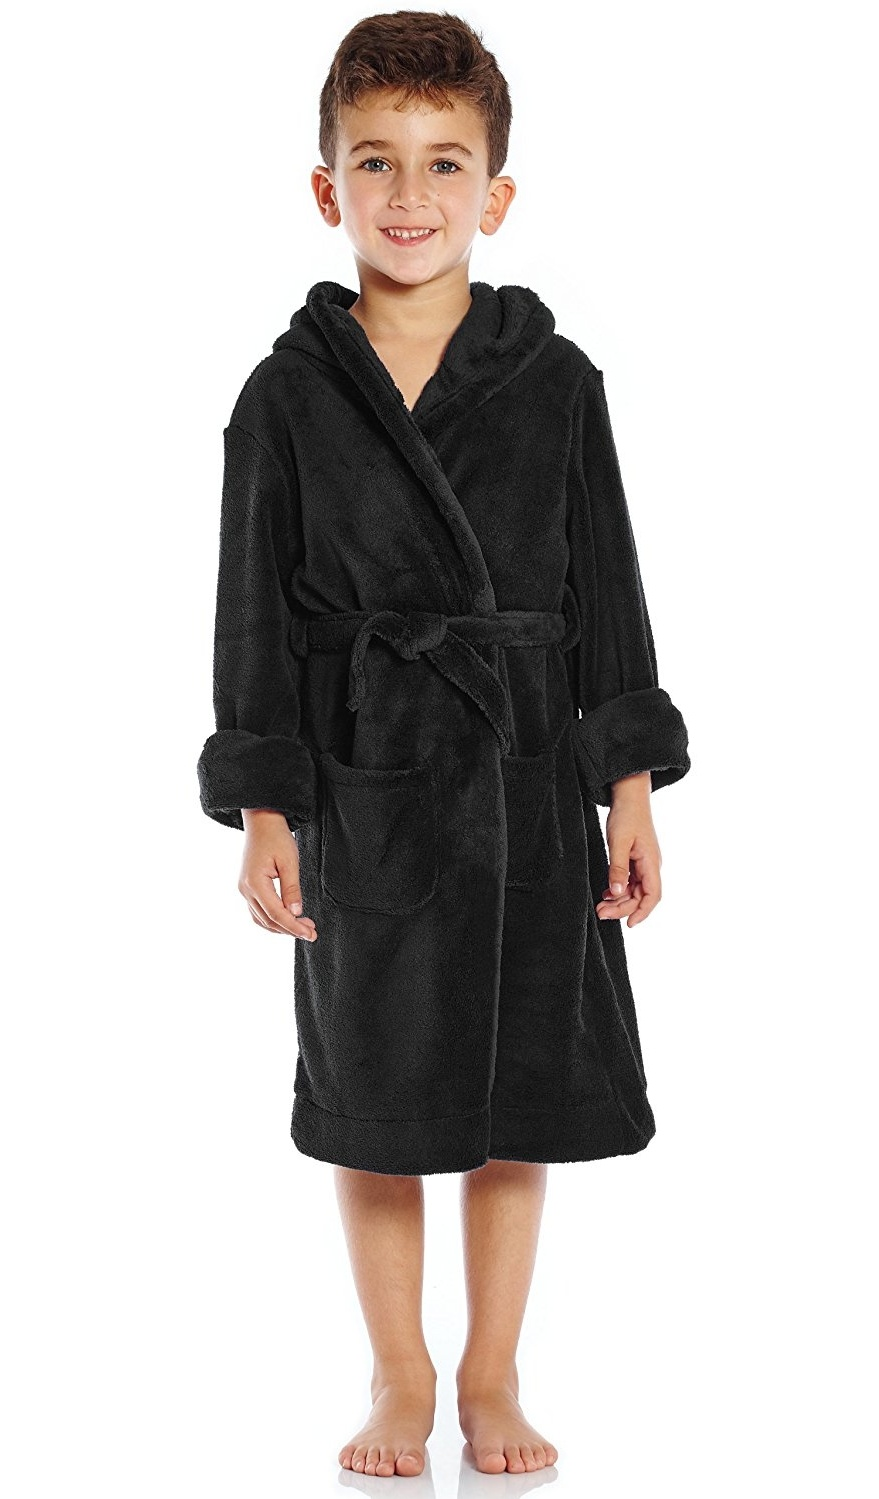 Leveret Kids Robe Boys Girls Solid Hooded Fleece Sleep Robe Bathrobe 2 Toddler-16 Years Variety of Colors